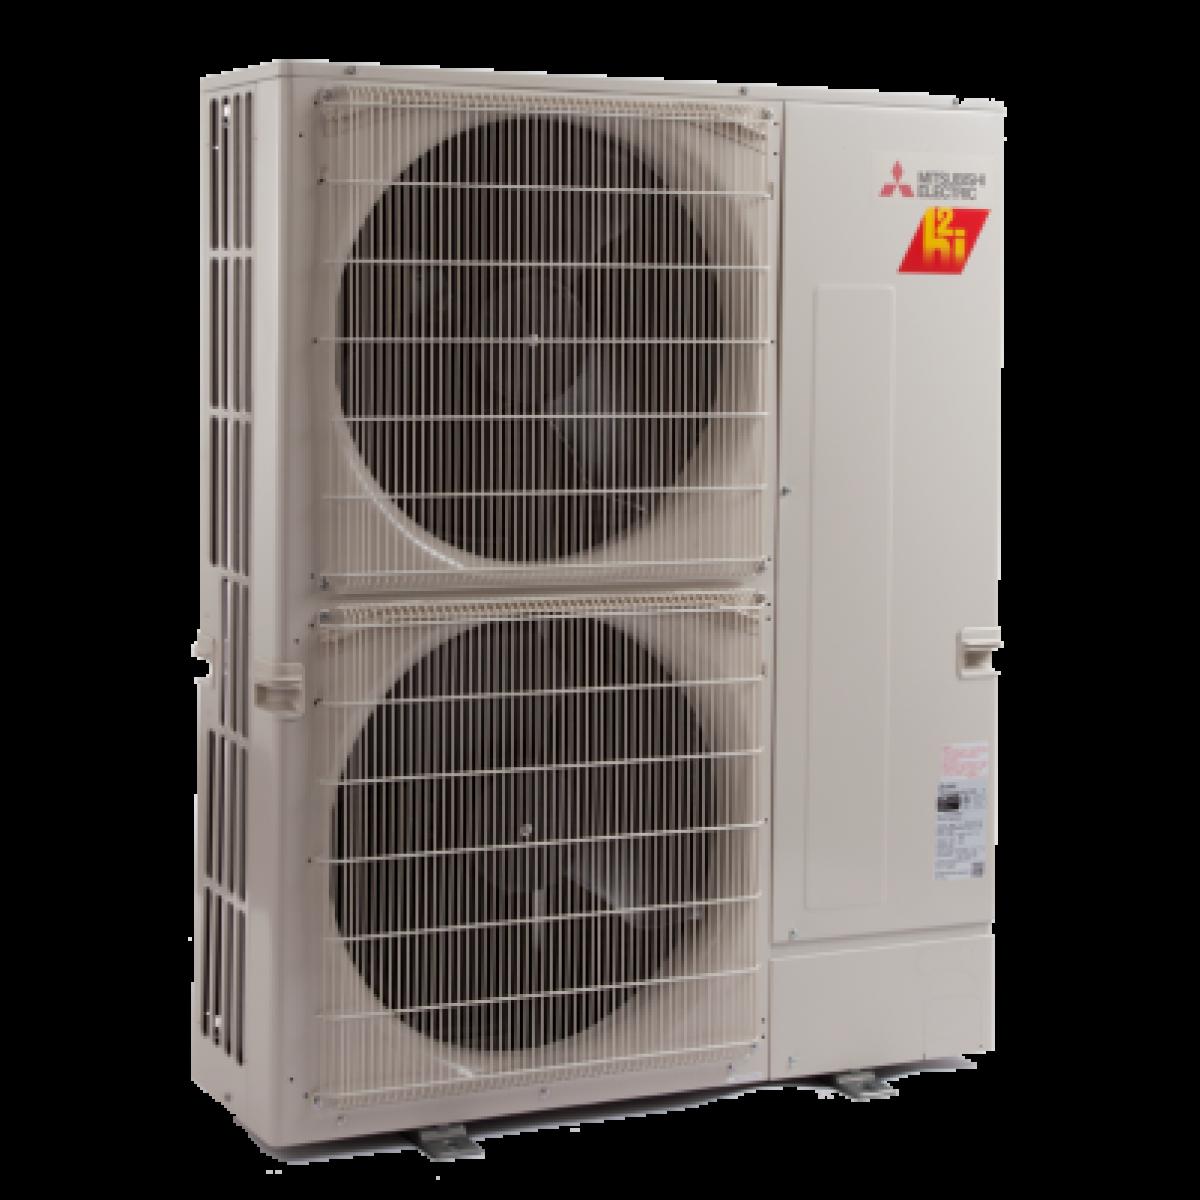 Mitsubishi 5 Zone 42k Btu Heat Pump Hyper Heat With Up To